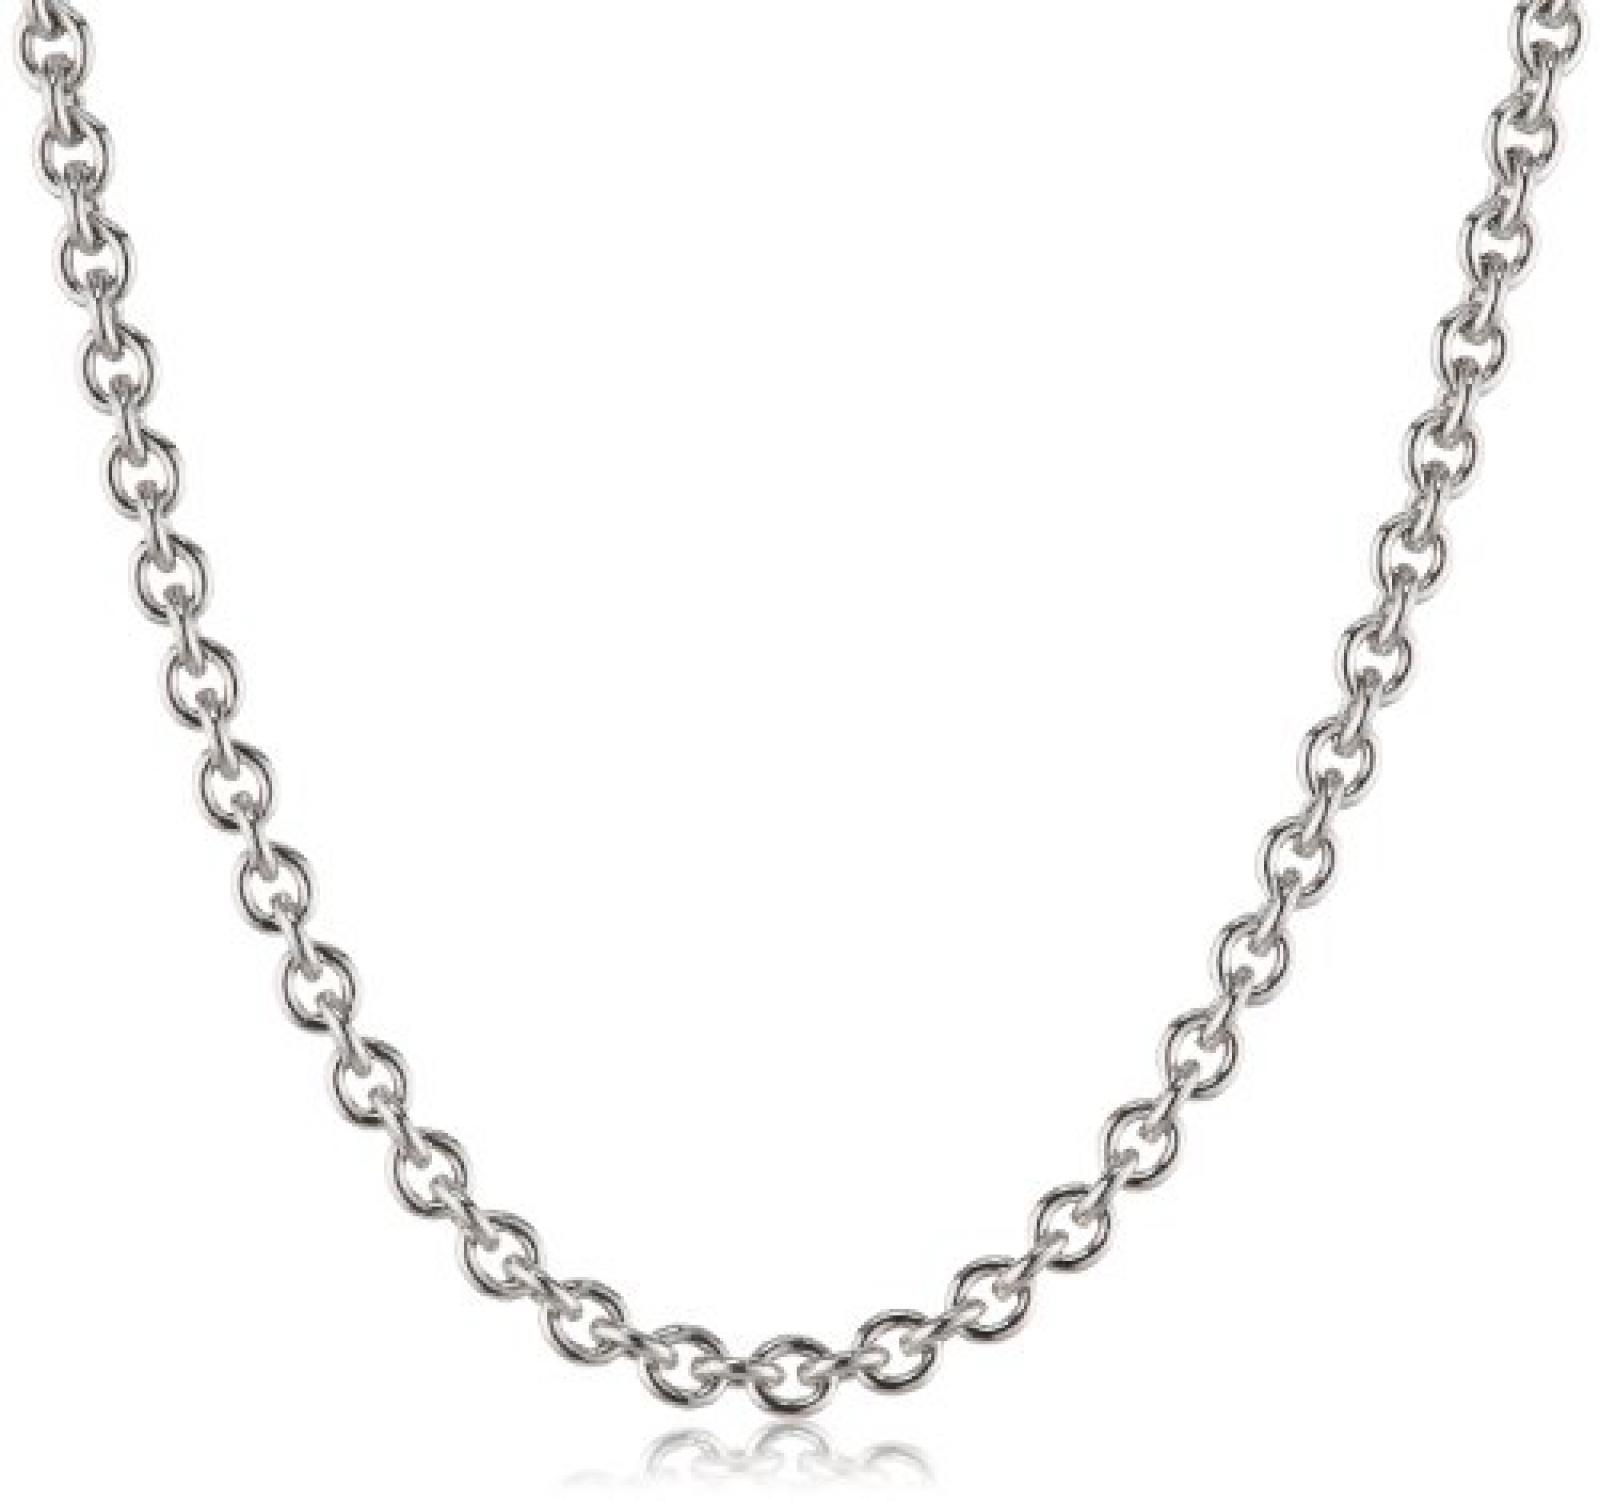 Amor Jewelry Unisex-Halskette 925 Sterling Silber 308878